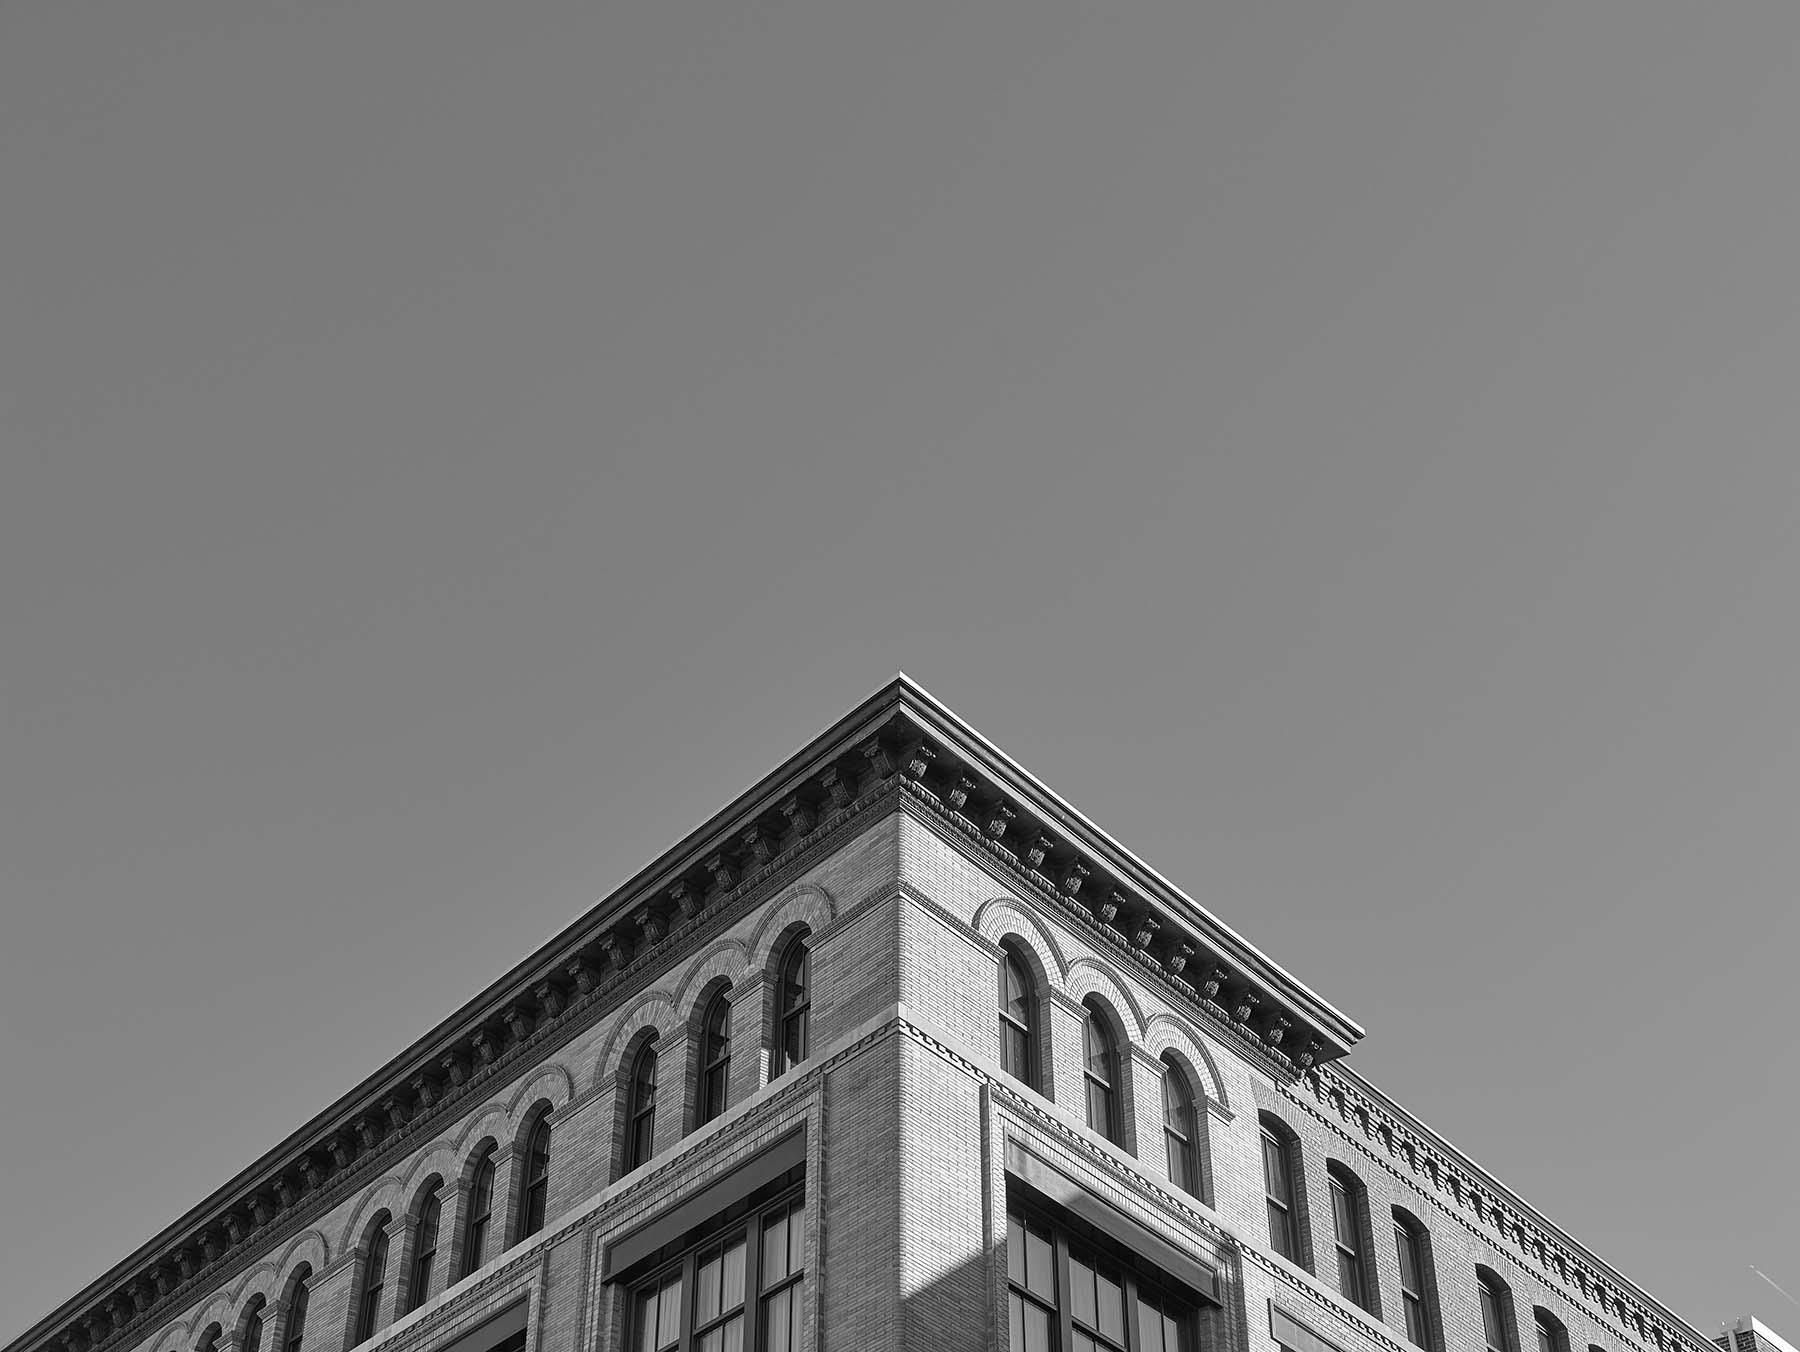 370 Congress Street, Boston USA